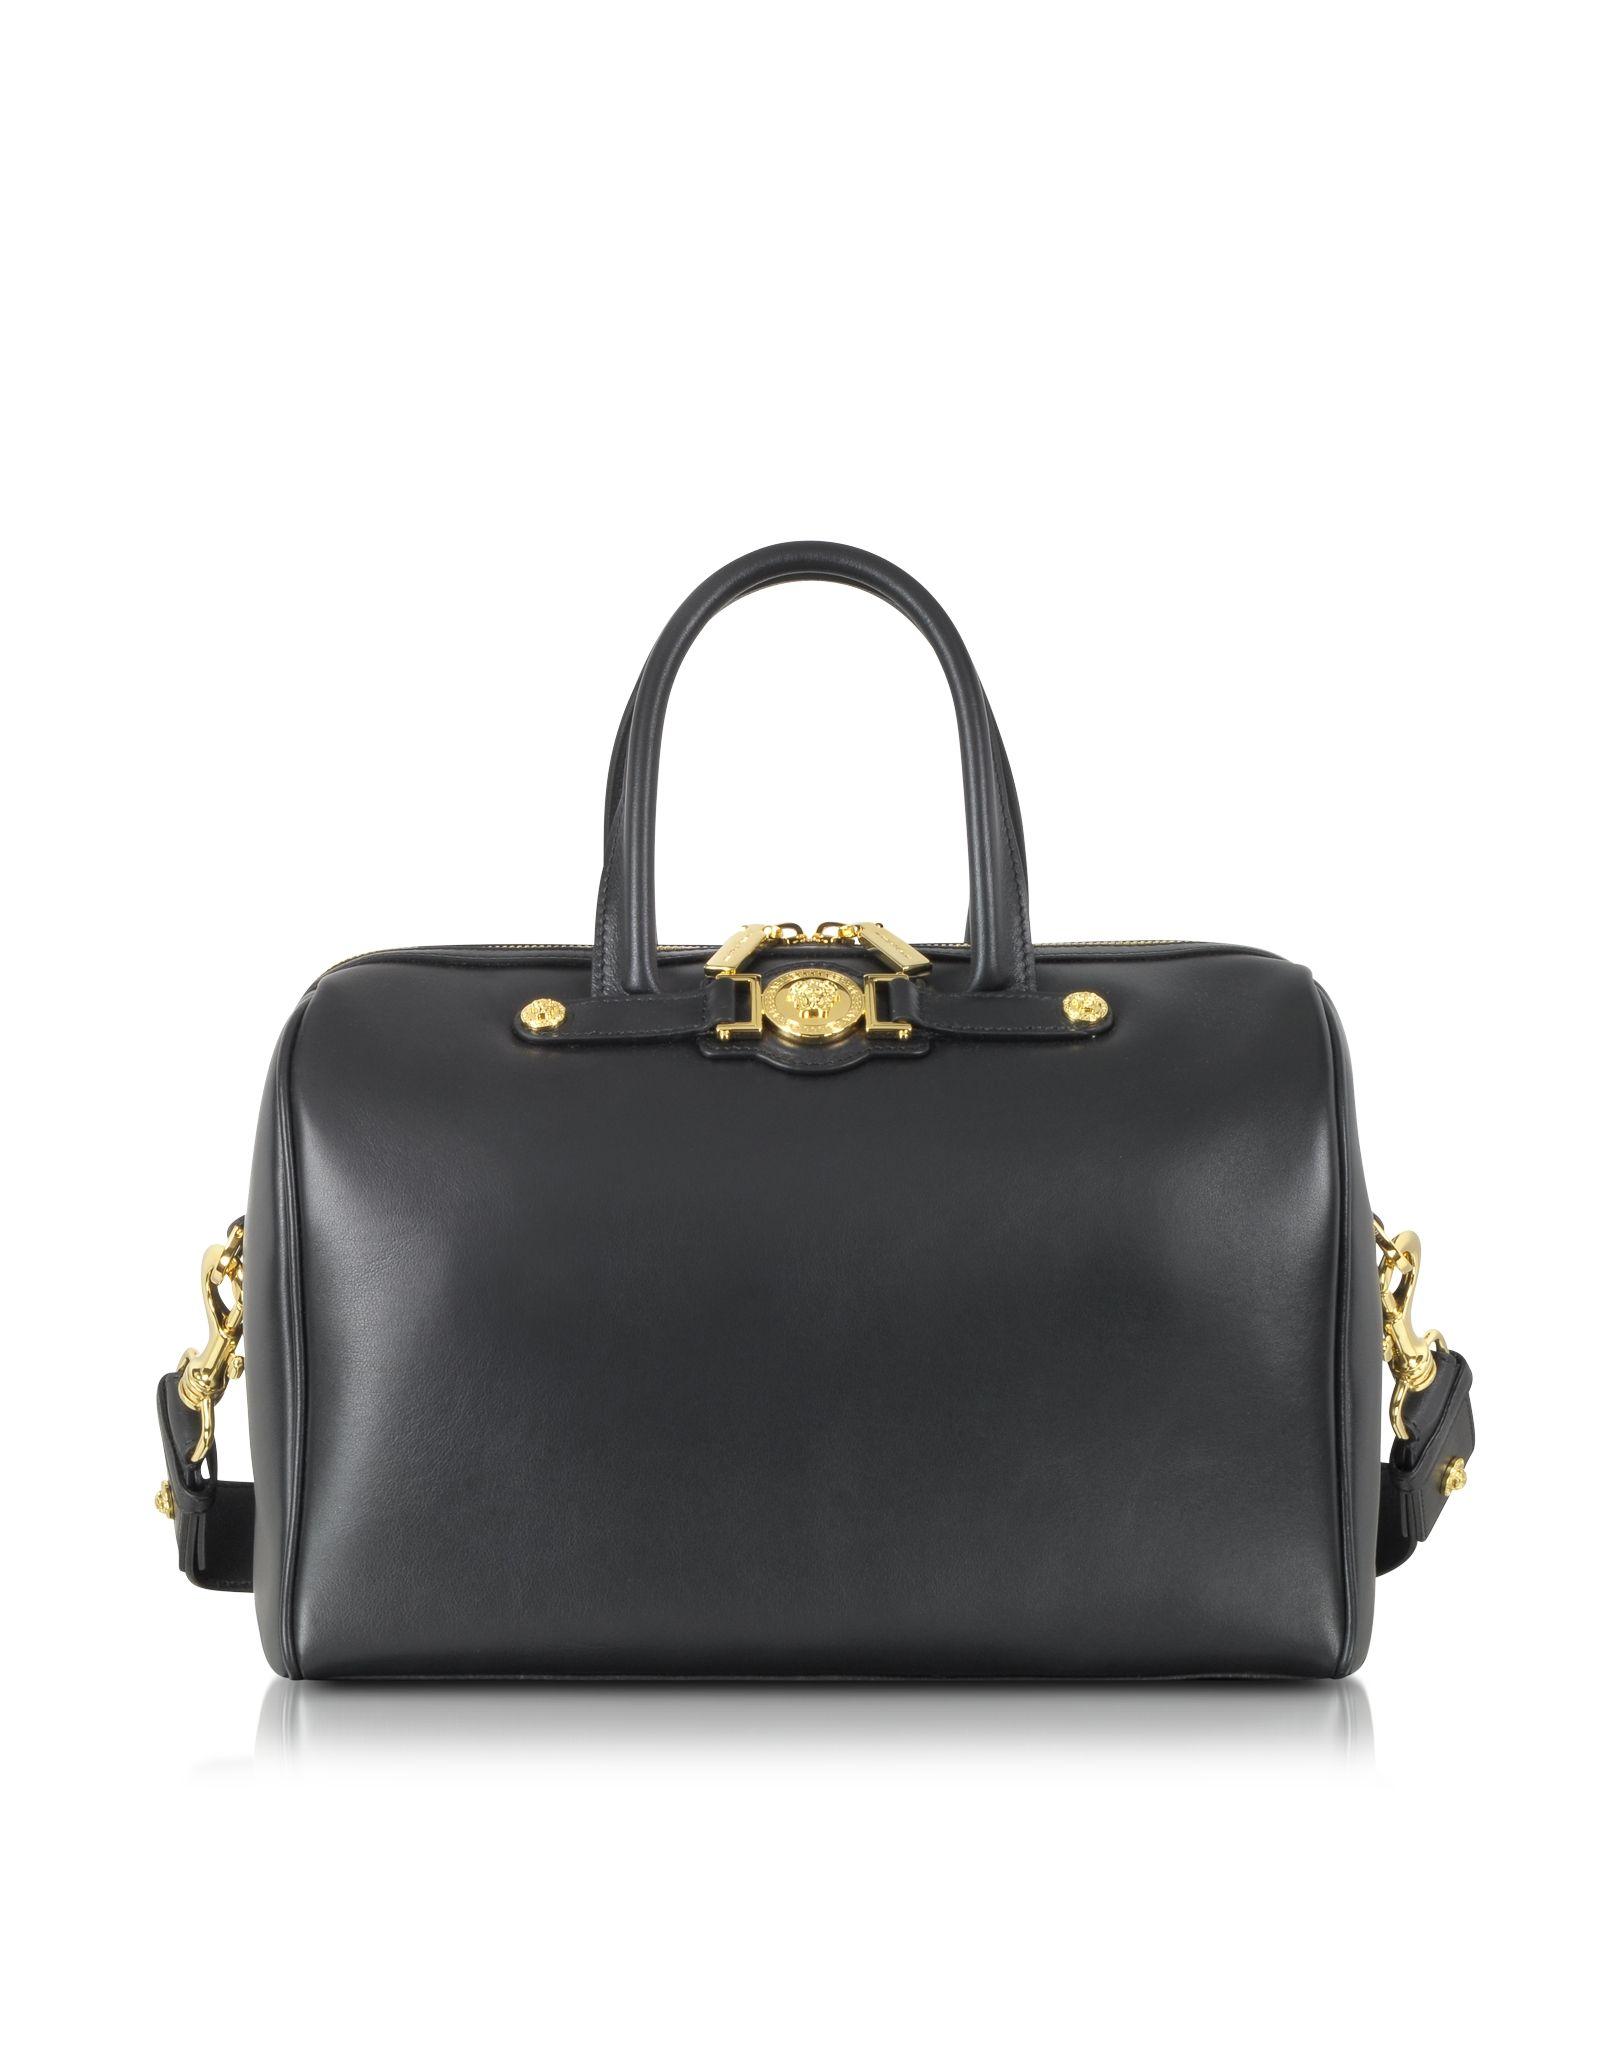 9fb9599d30 Versace Signature Large Duffle Bag at FORZIERI